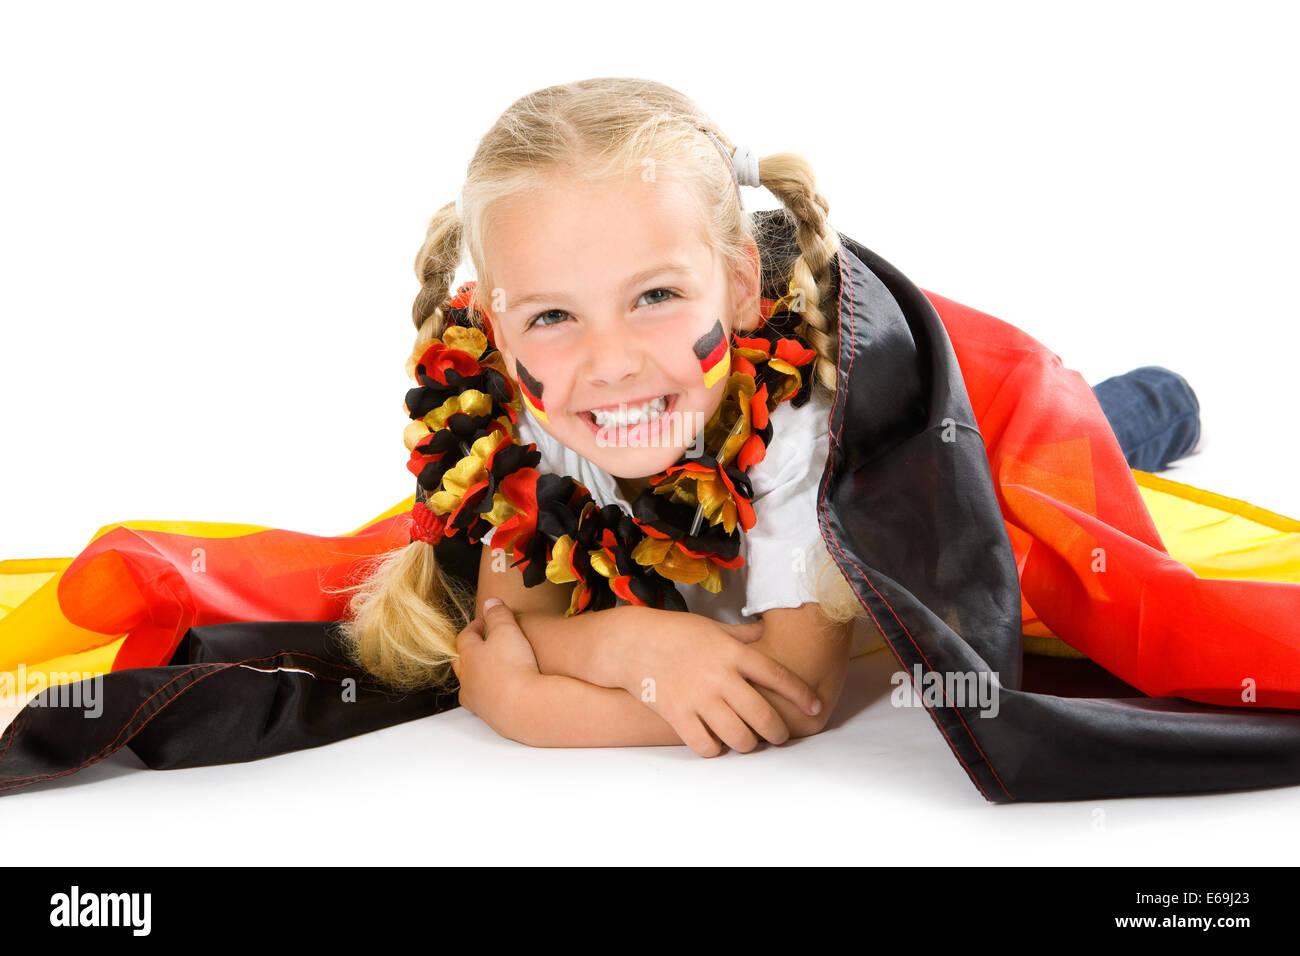 Girl, ventilateur, la culture allemande,patriotisme,fan de foot Photo Stock